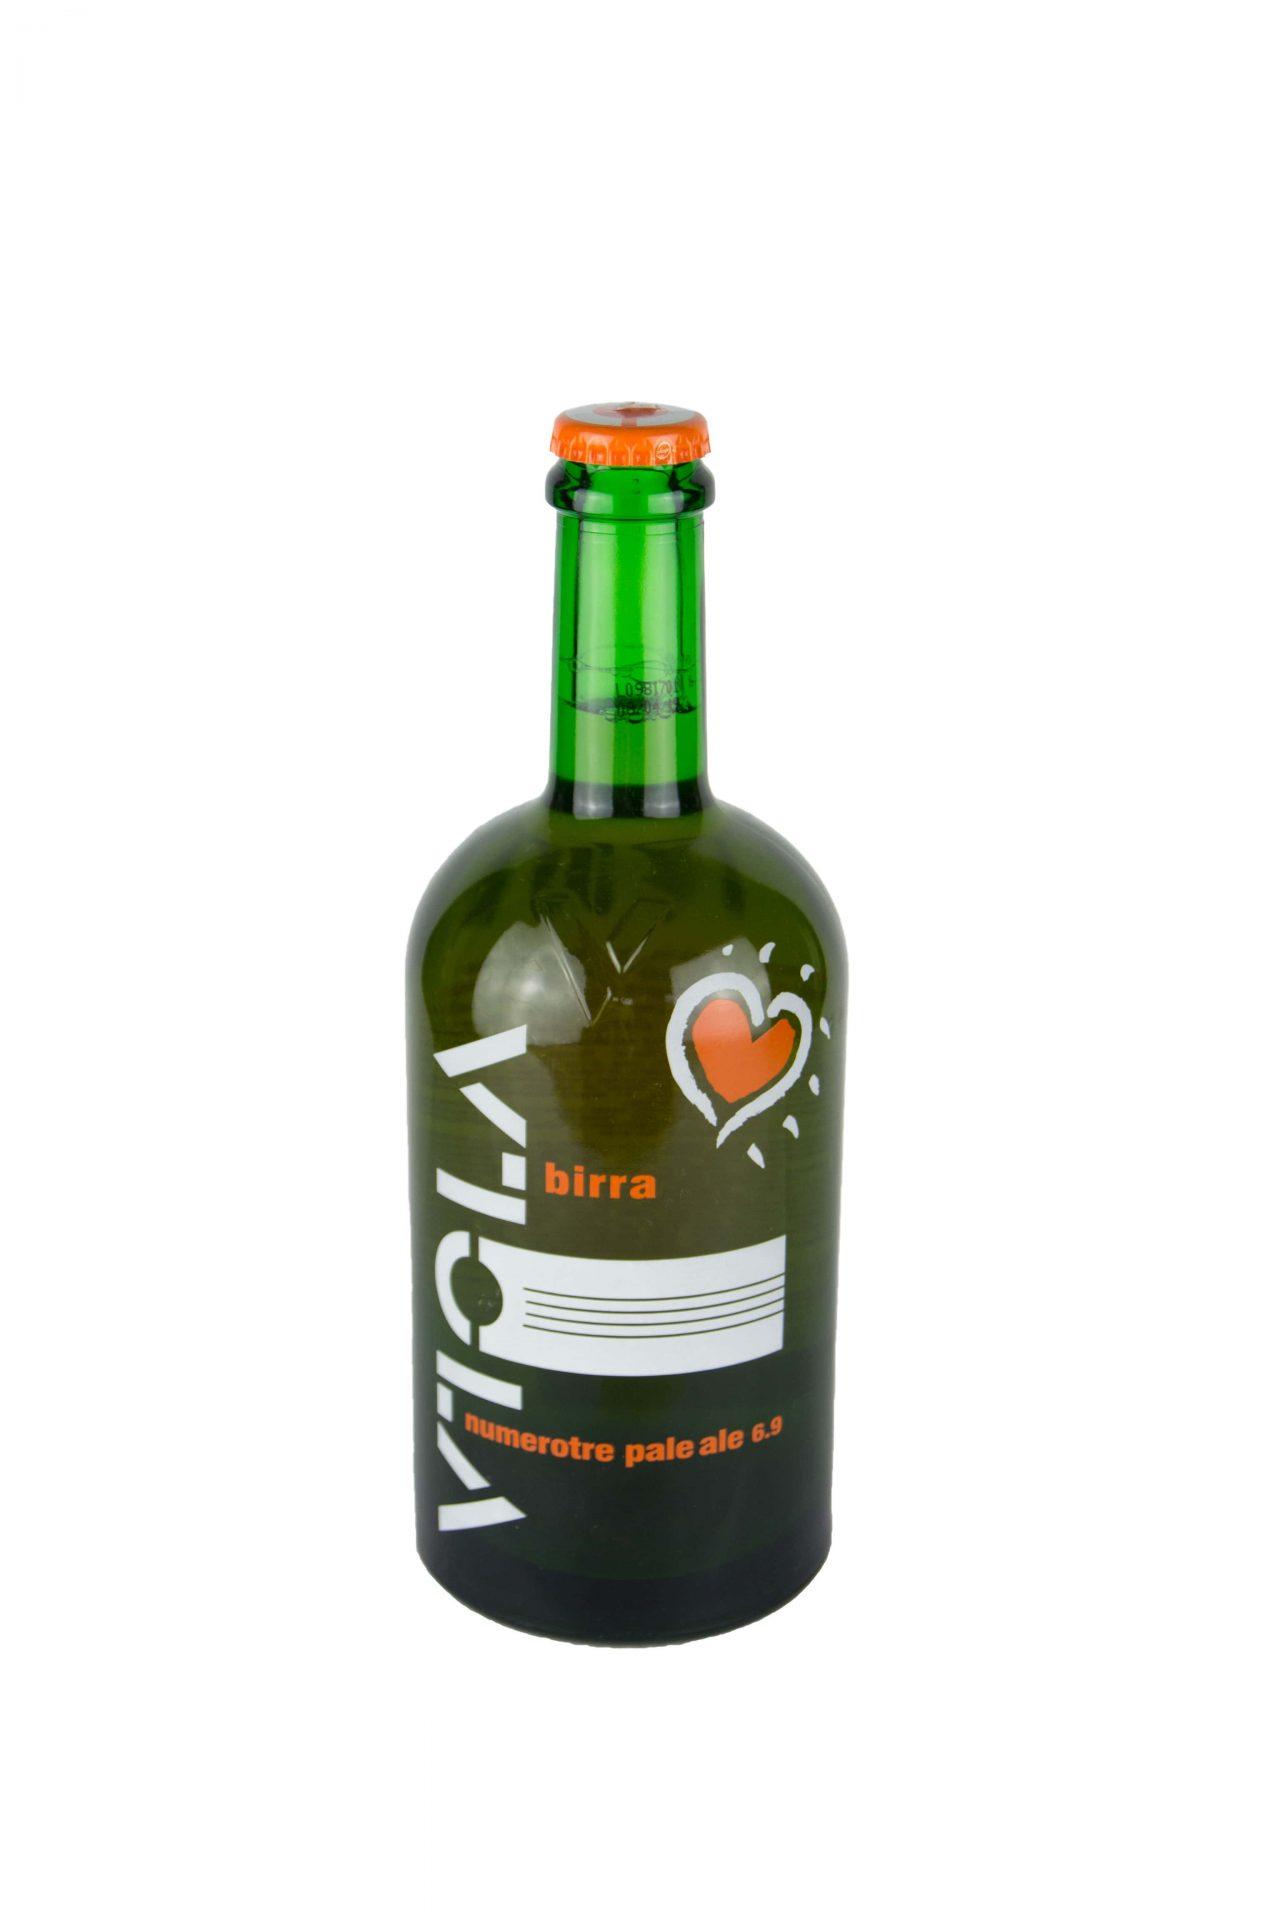 Viola – Numerotre Pale Ale